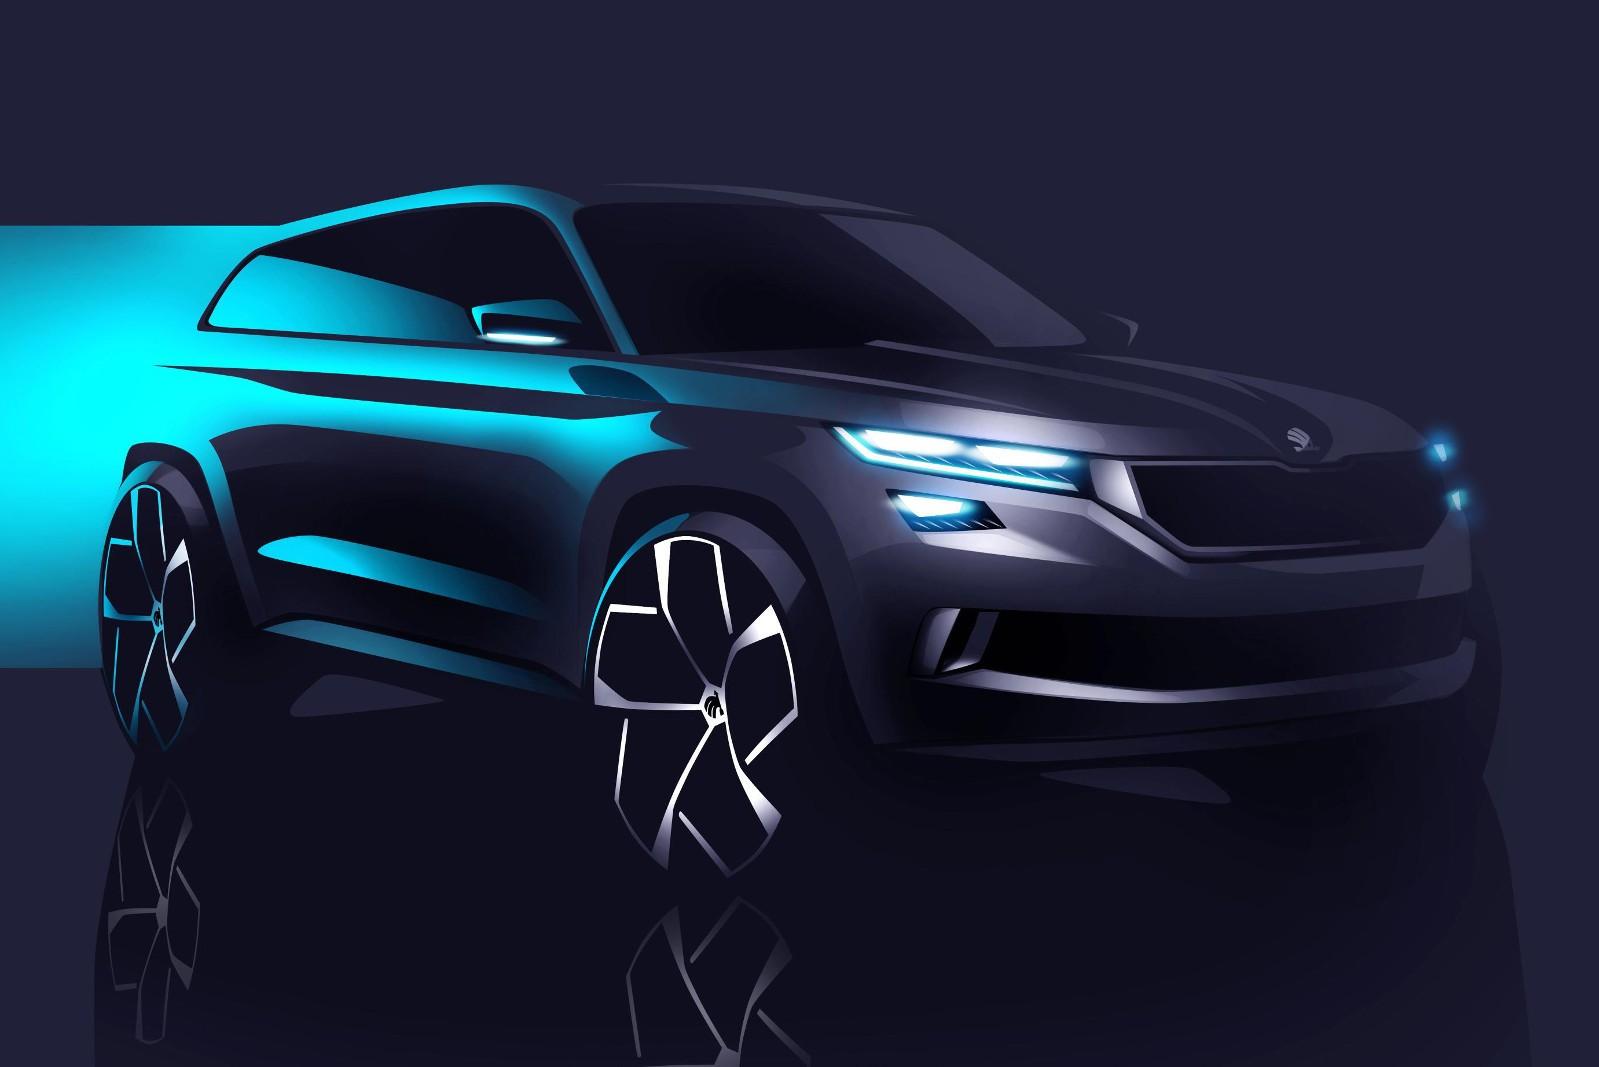 Skoda Visions Concept Previews 7 Seater Quot Kodiak Quot Suv At Geneva 2016 Autoevolution